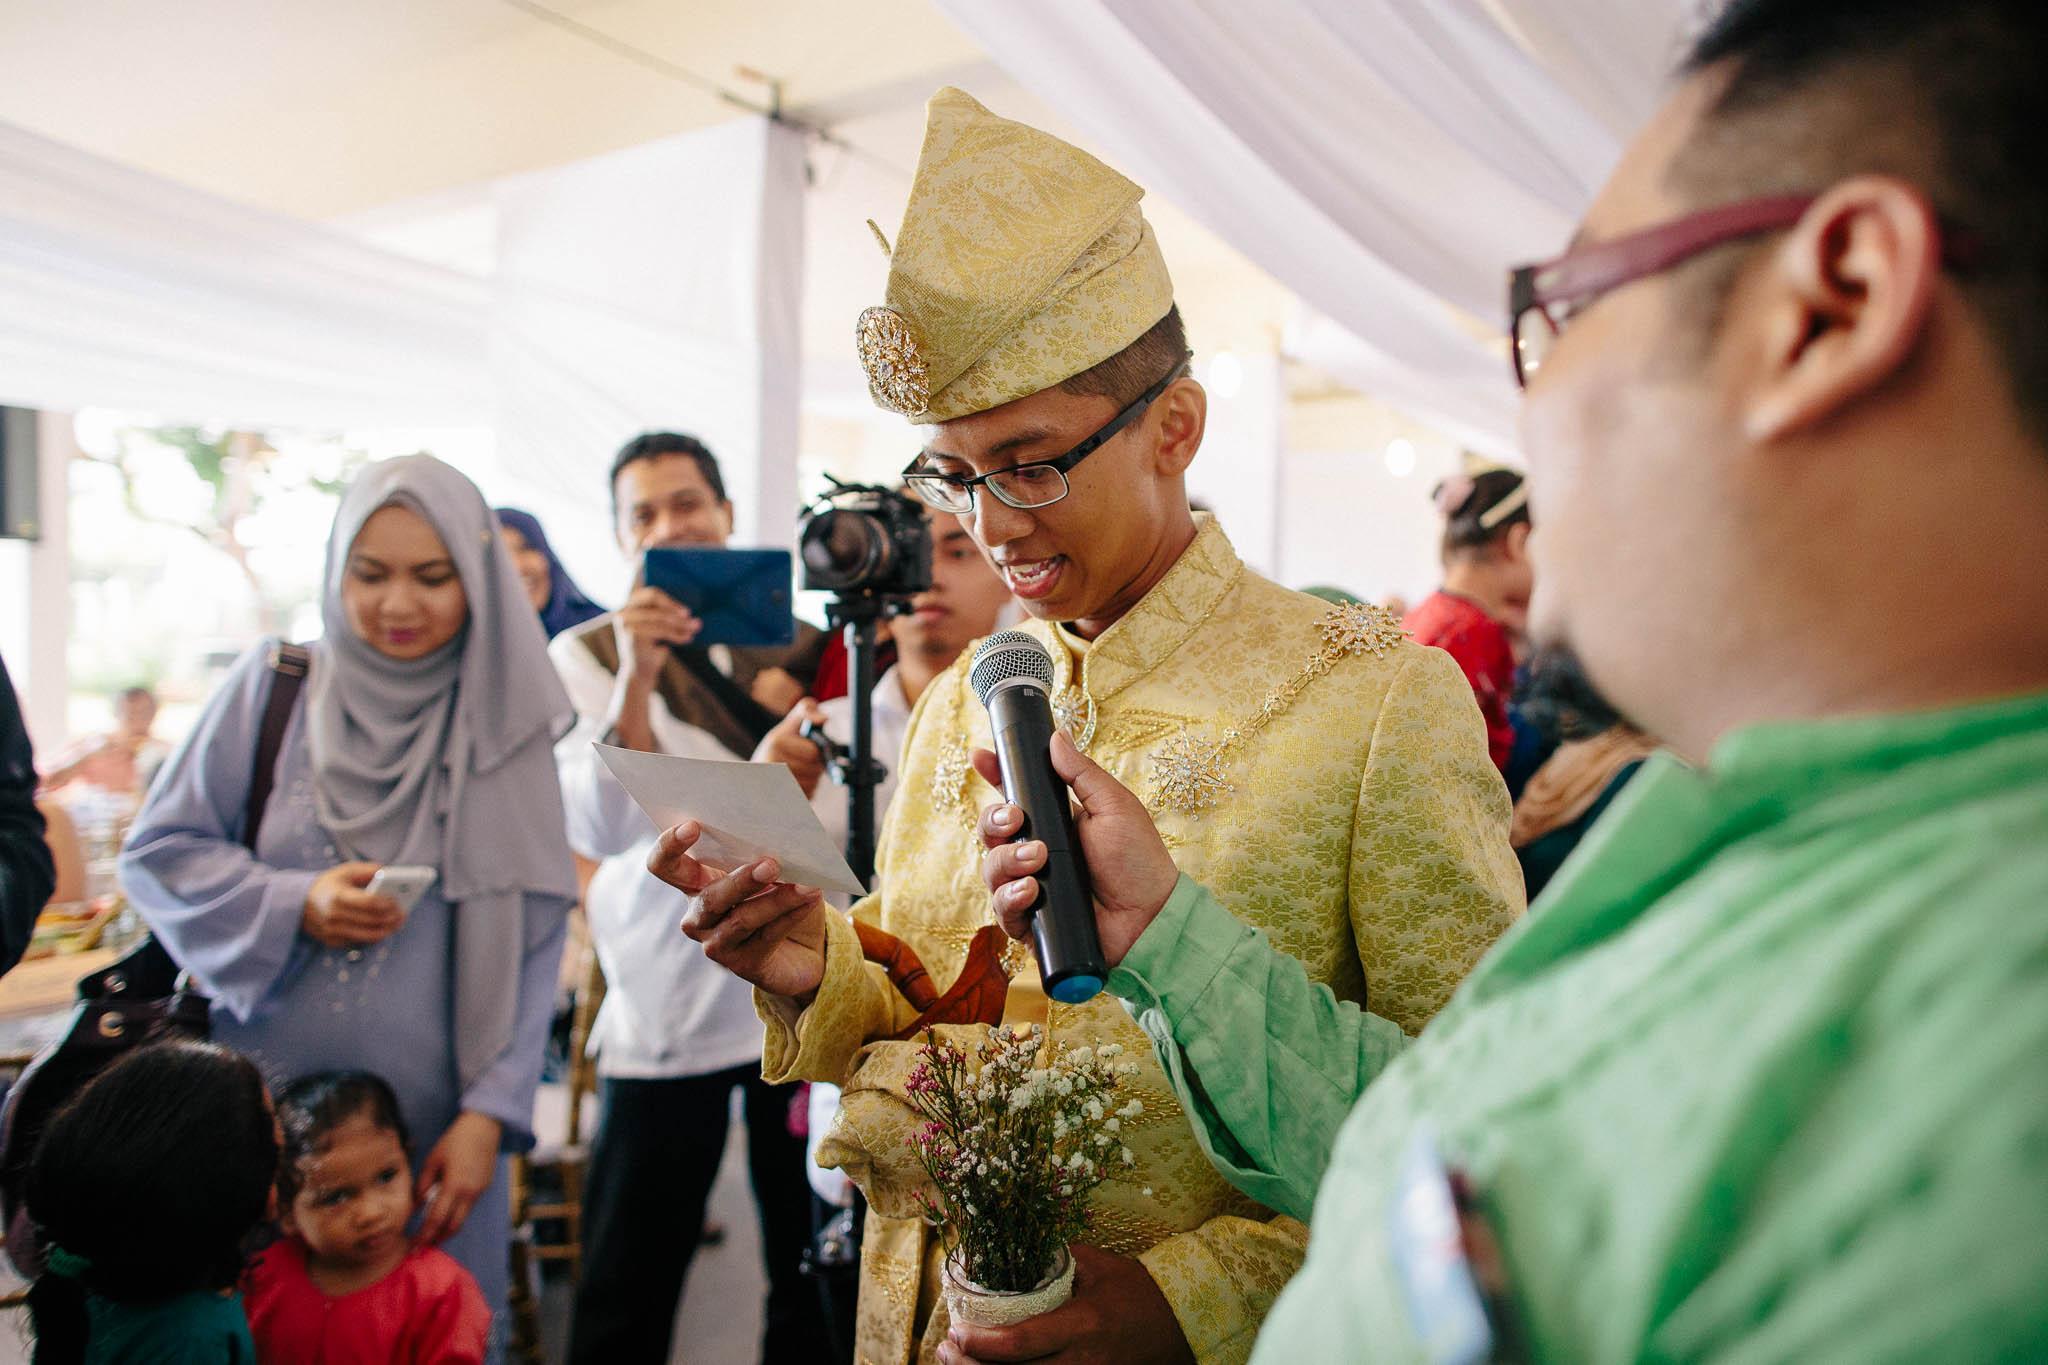 singapore-wedding-photographer-sharalyn-syazwan-030.jpg